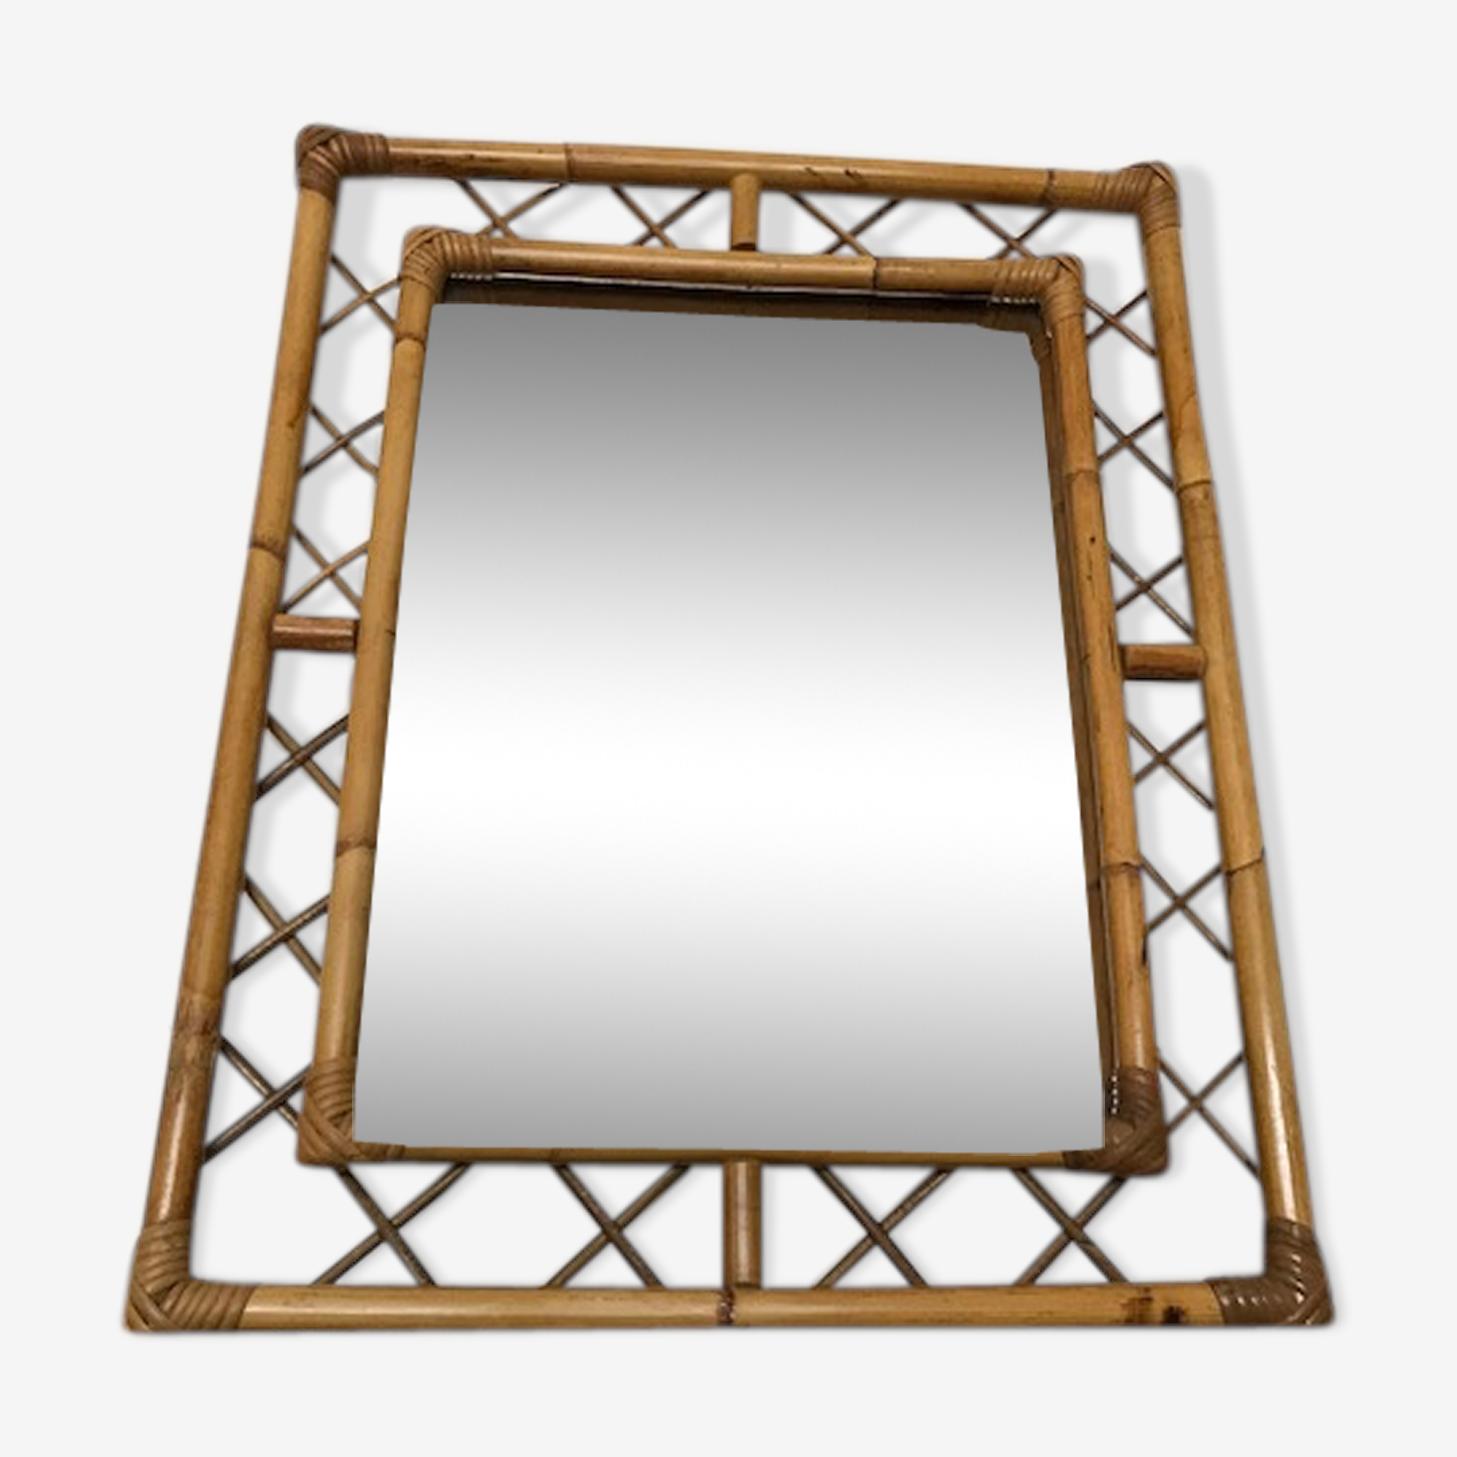 Vintage rattan mirror  51x66cm